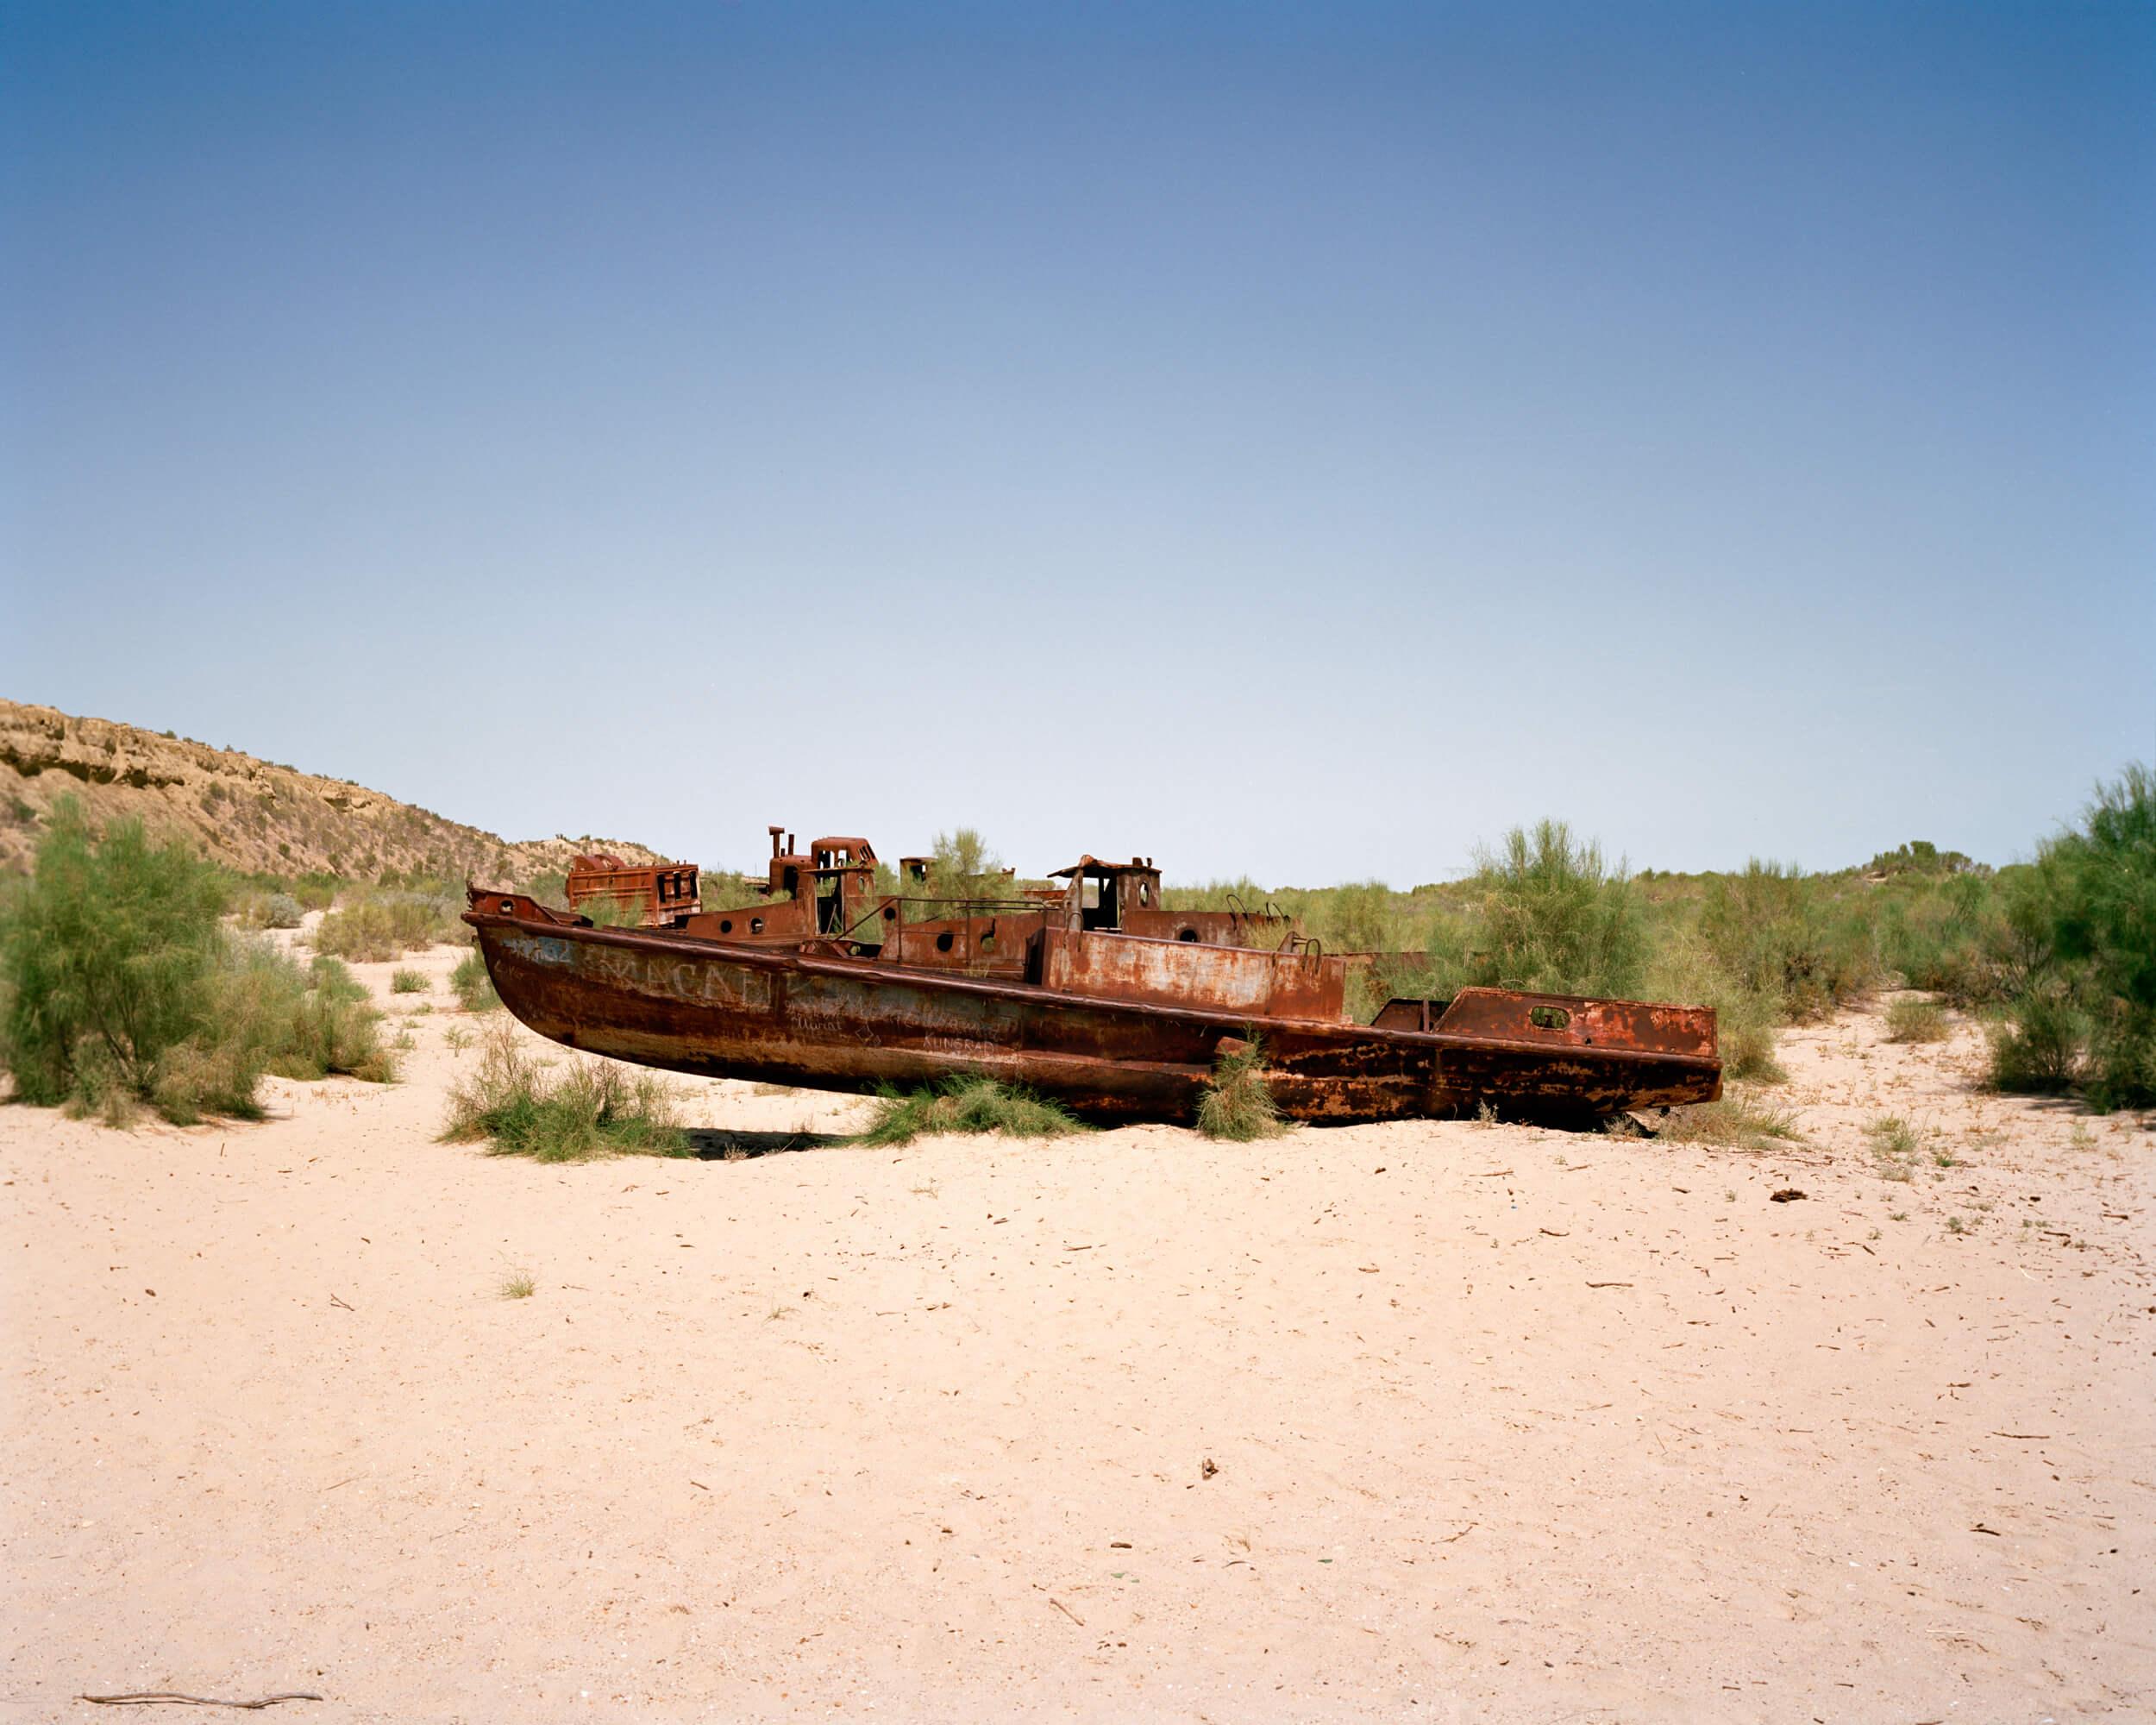 marco-barbieri-water-in-the-desert-52.jpg